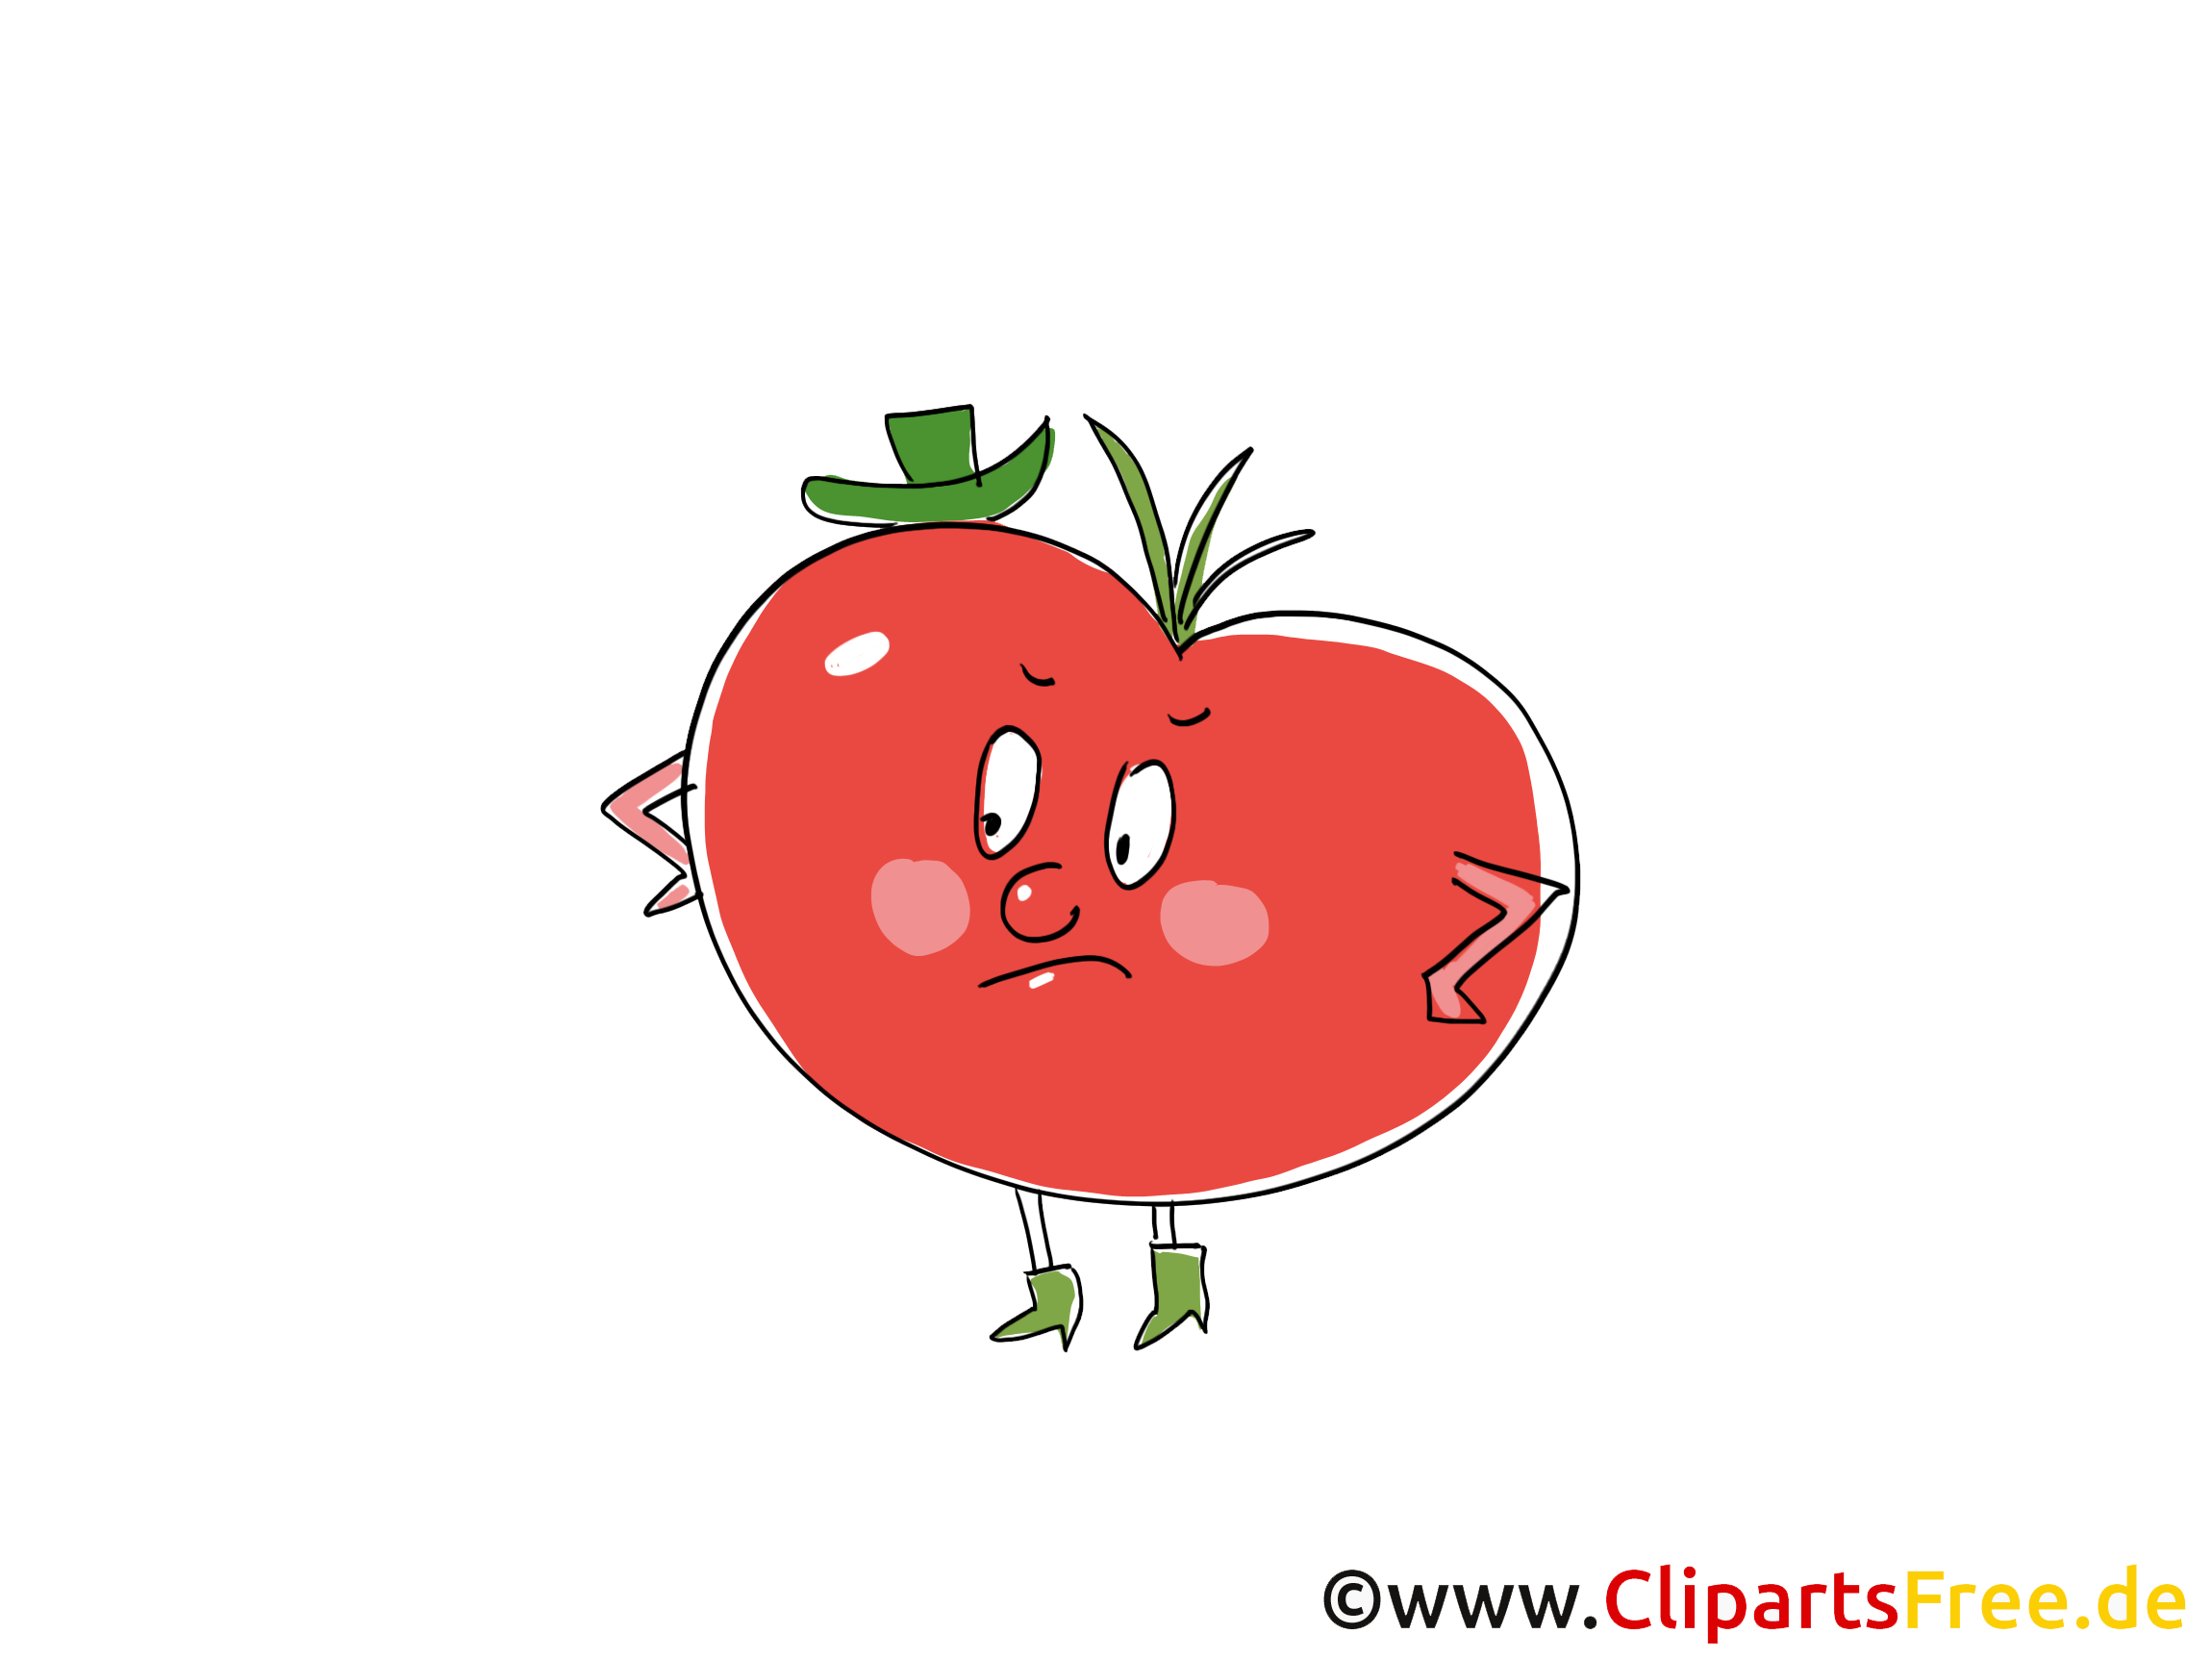 Tomate Clip Art, Illustration, Bild, Cartoon